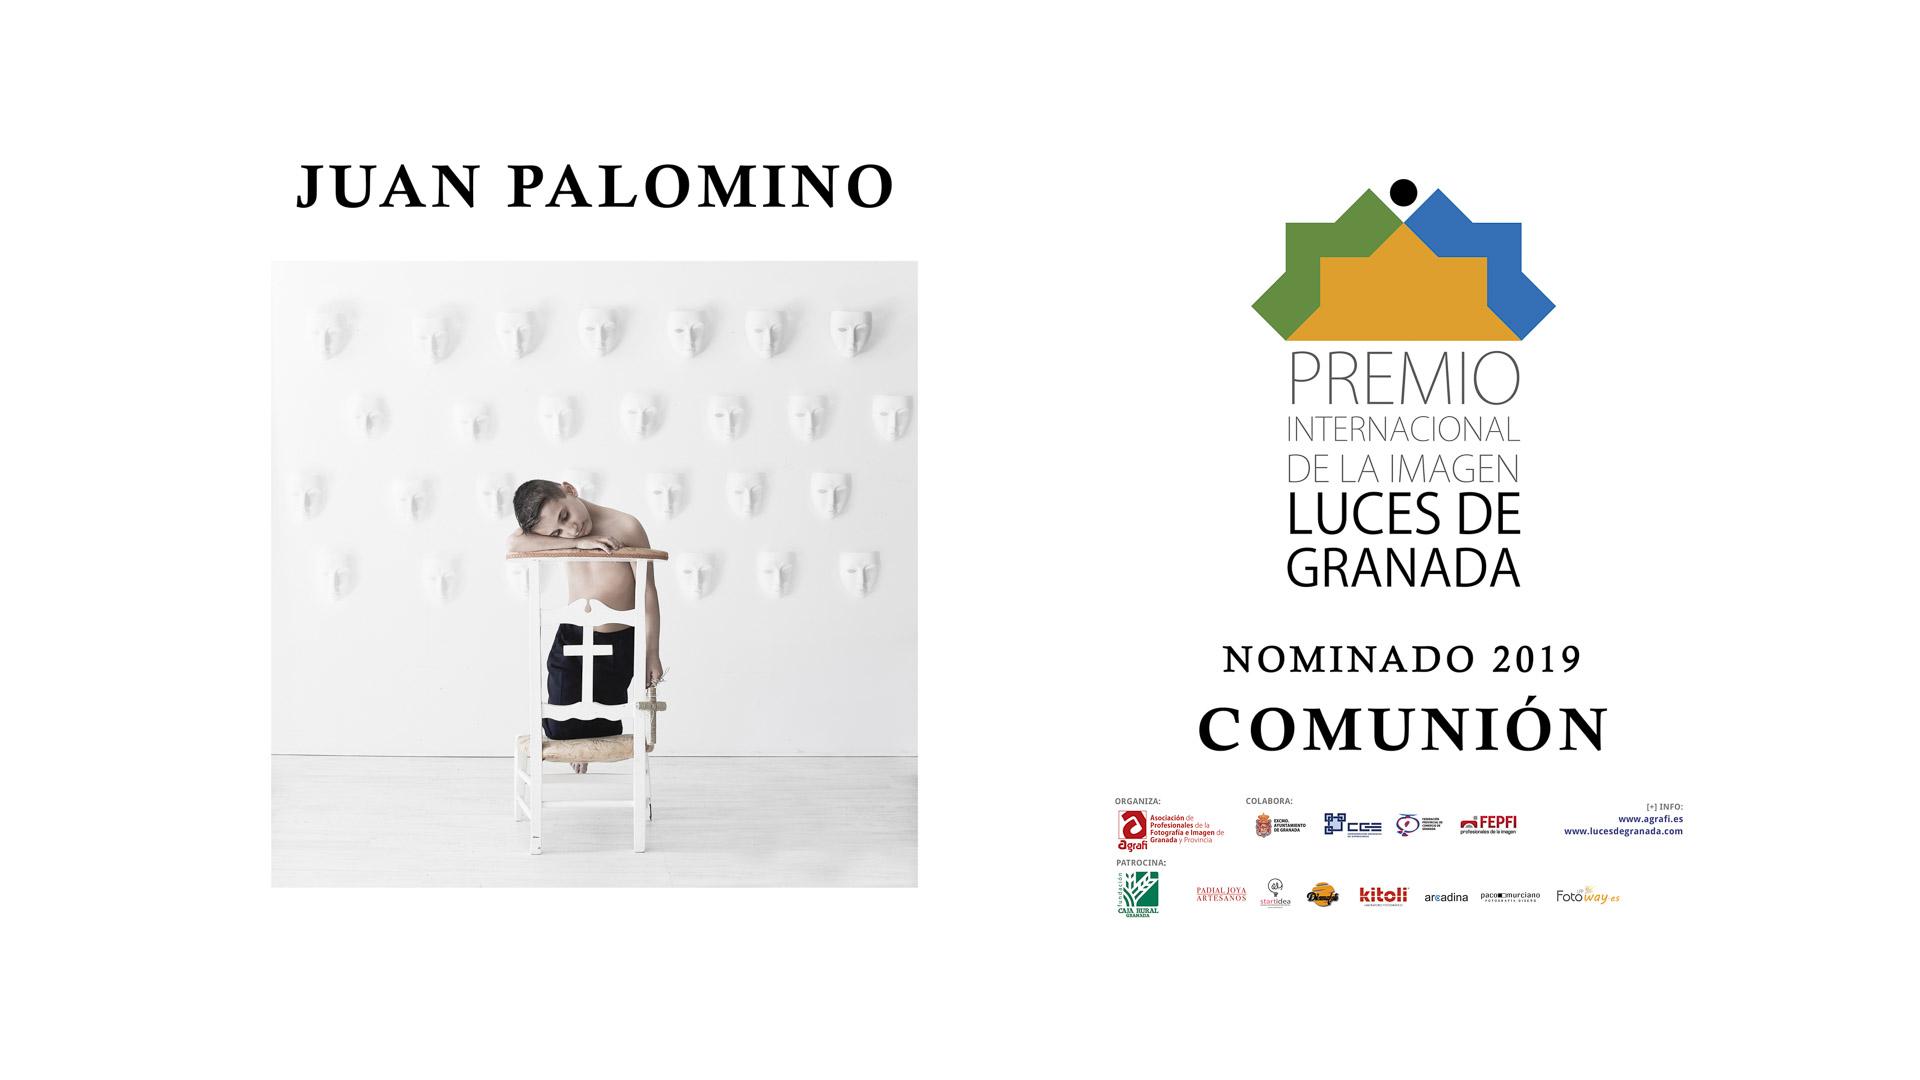 COM45_JUAN PALOMINO